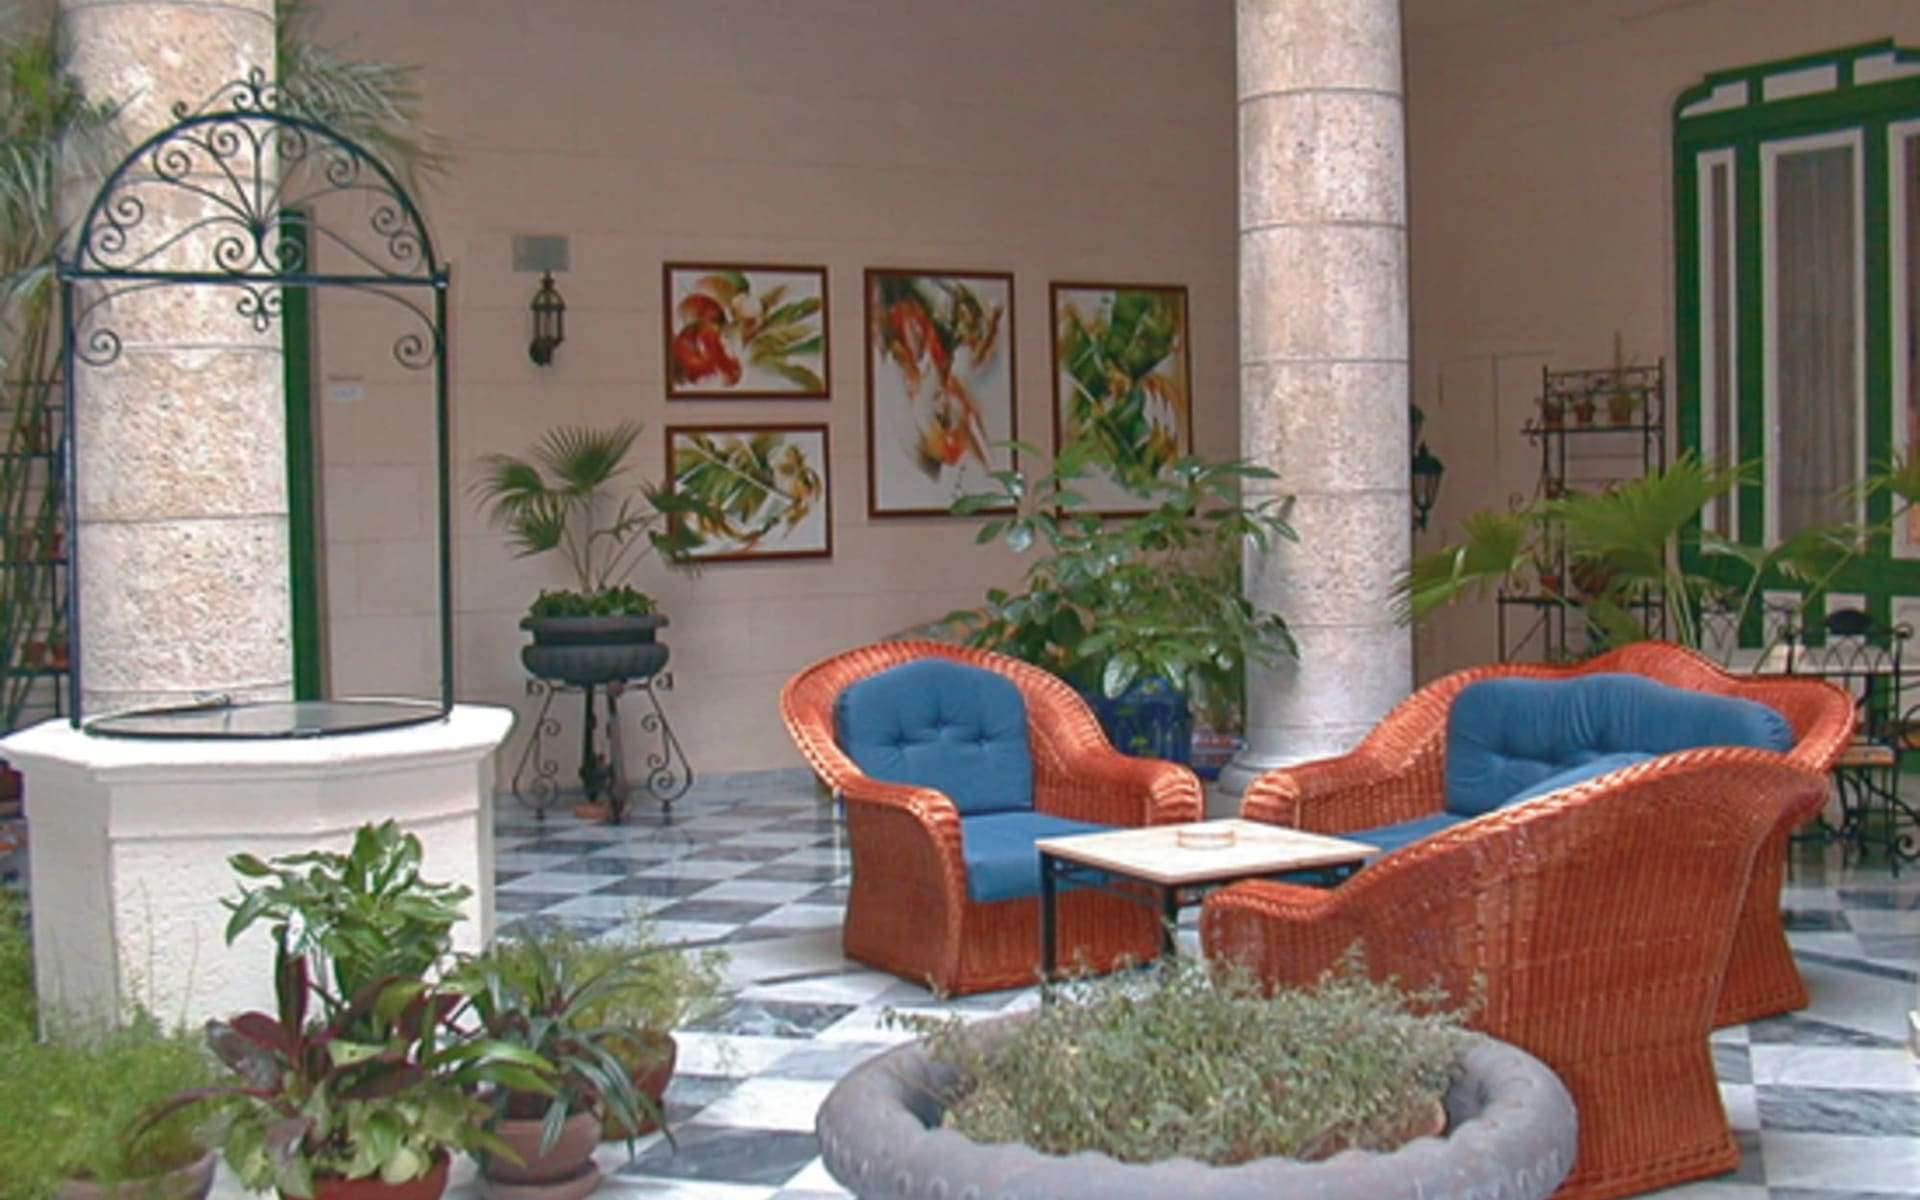 Hotel Florida in Havanna: Havana_Hotel Florida_Lobby